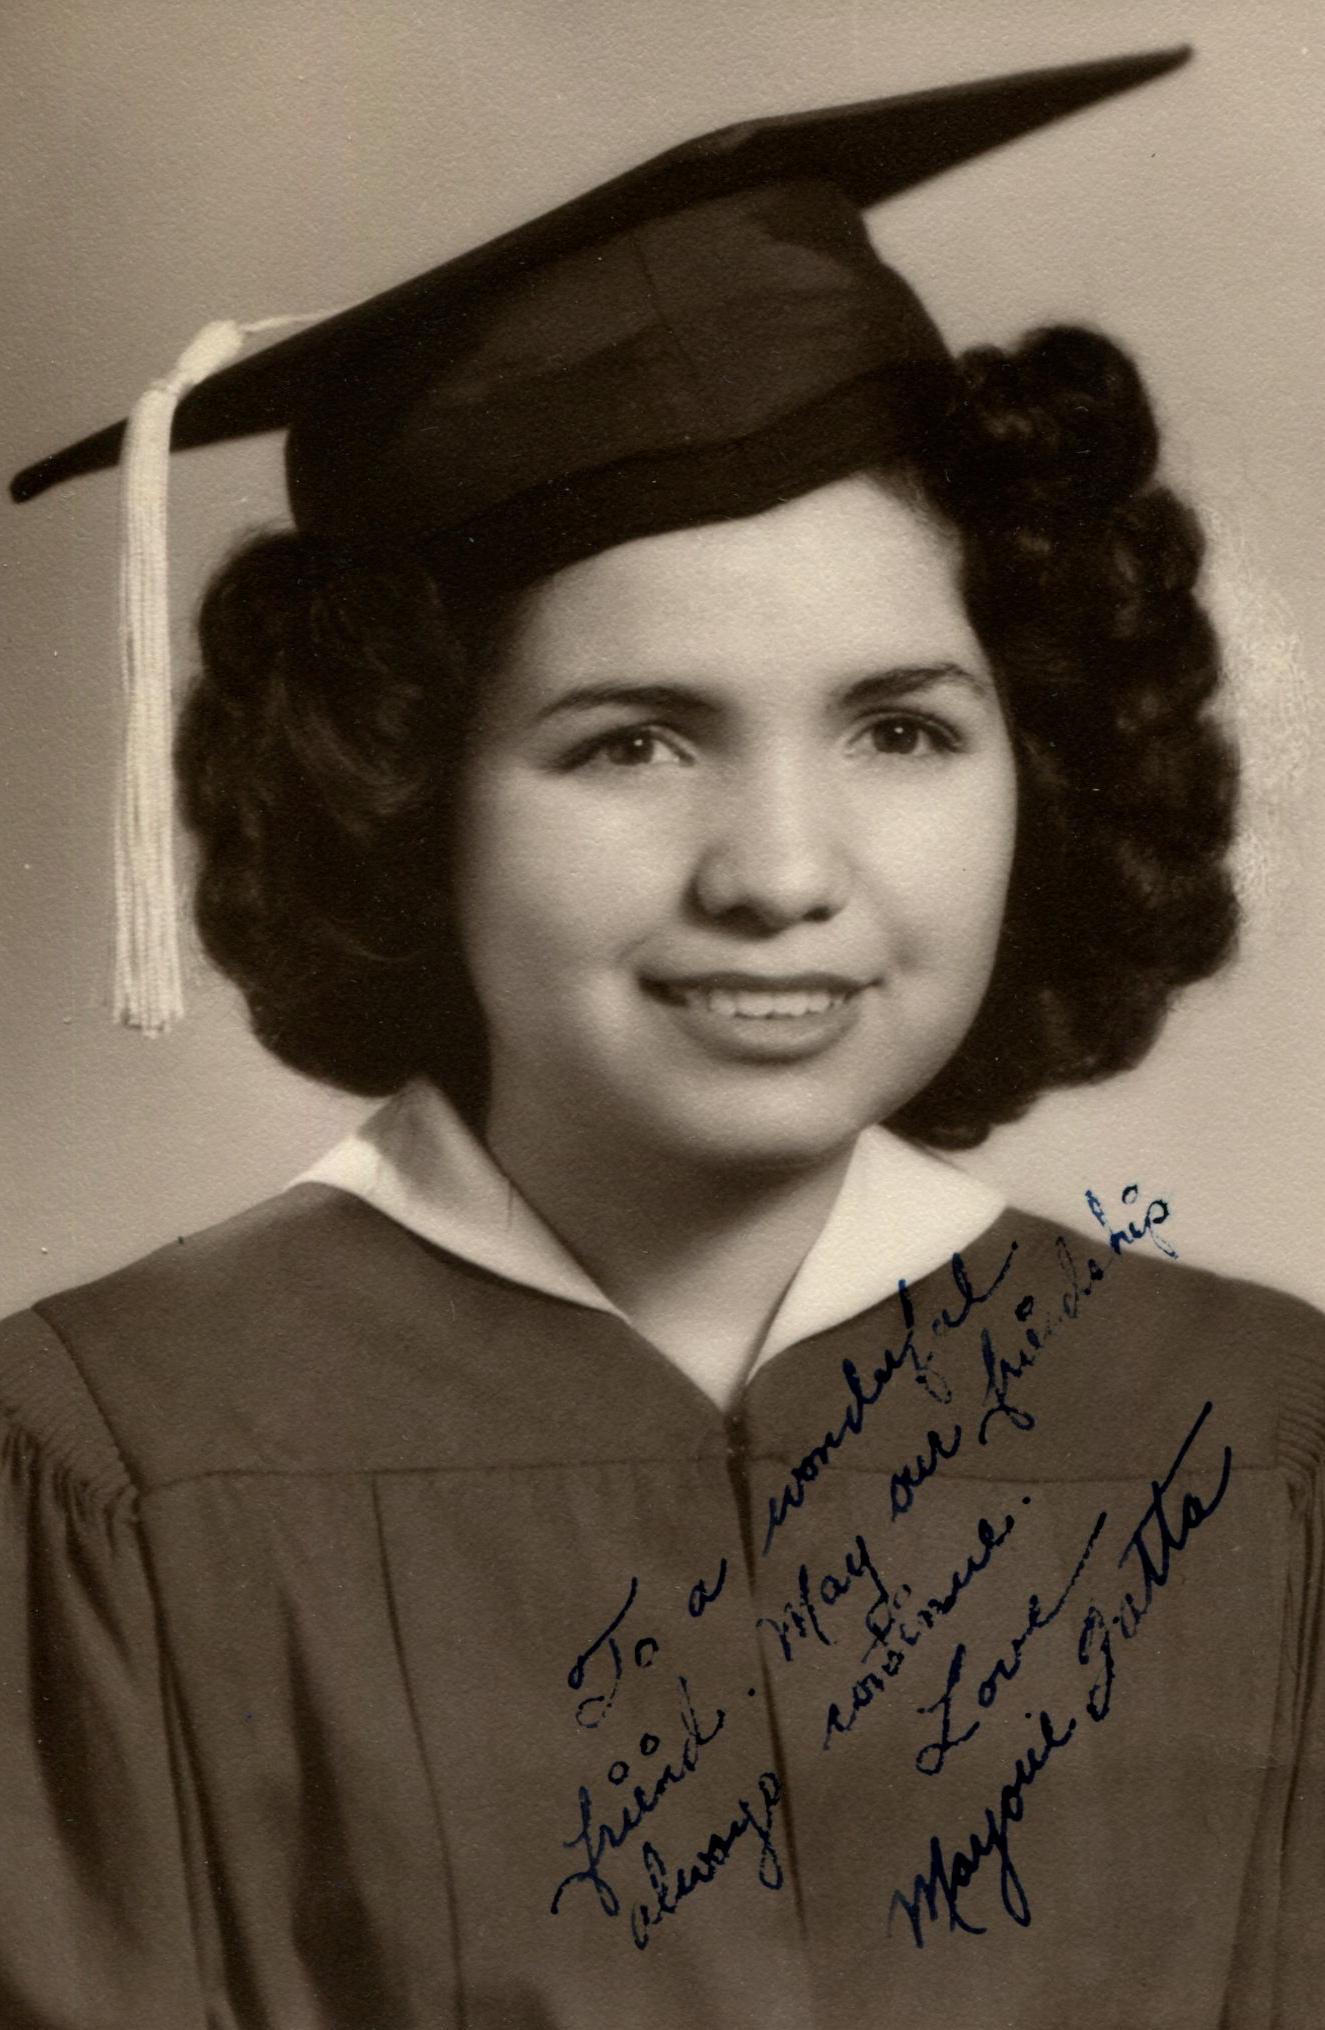 A friend of Margarita's, Marjorie Fatta, W'47